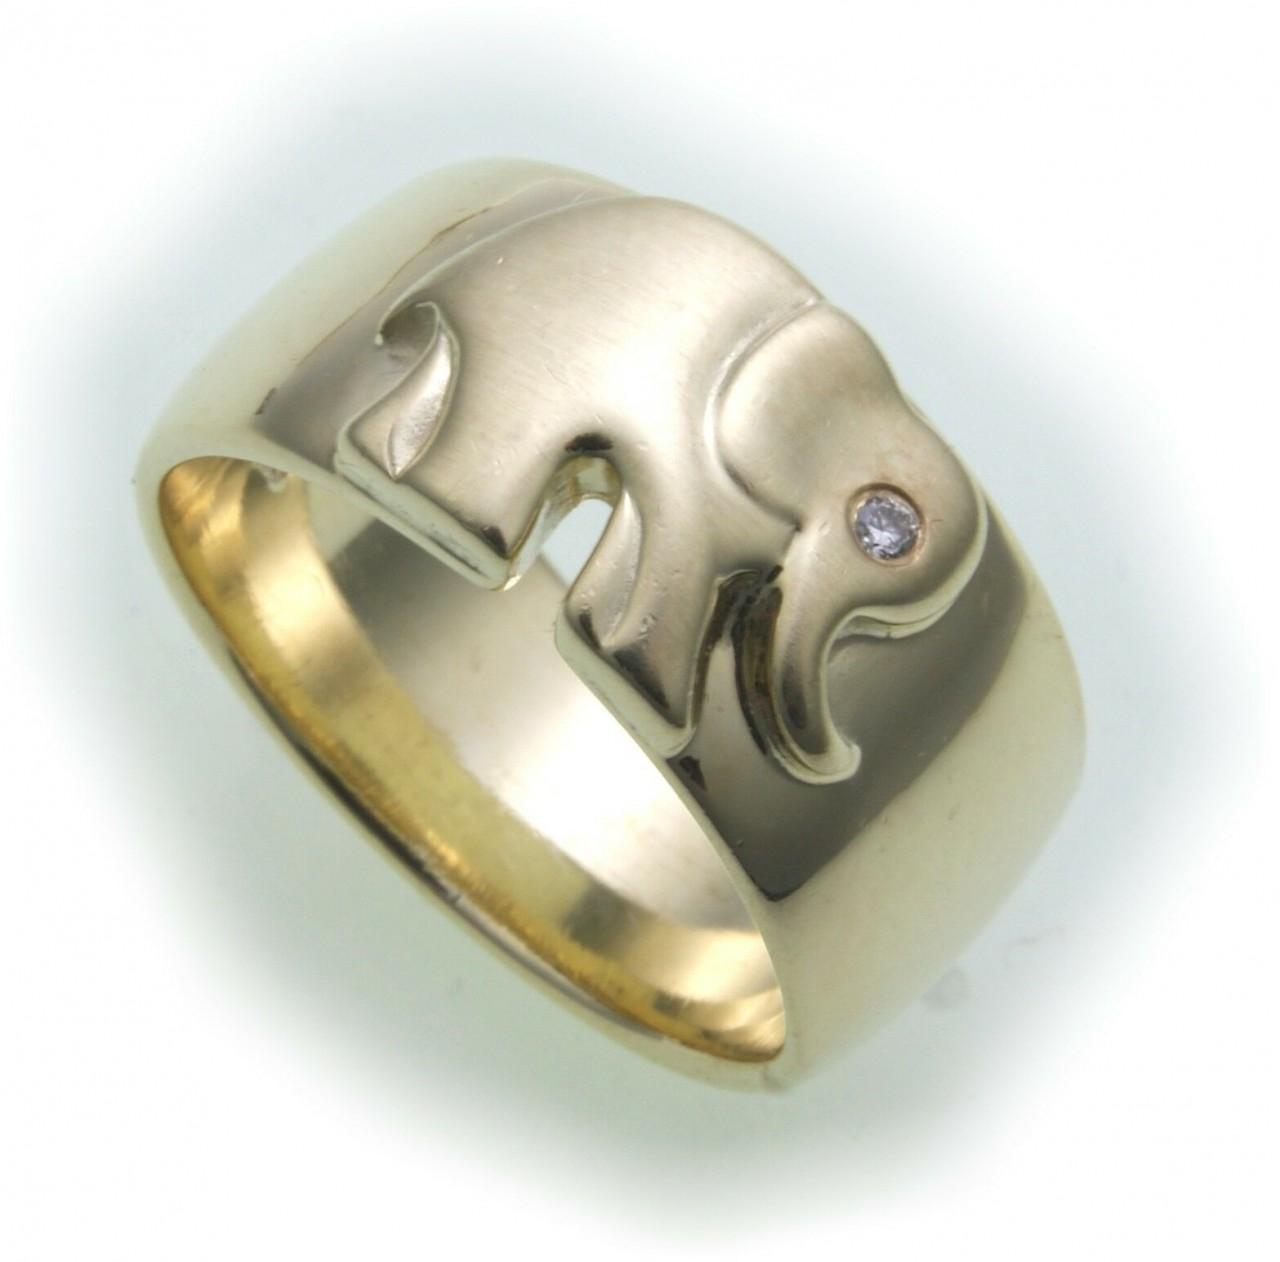 Damen Ring Elefant echt Gold 750 Brillant 0,01ct si 18kt Diamant massiv Gelbgold